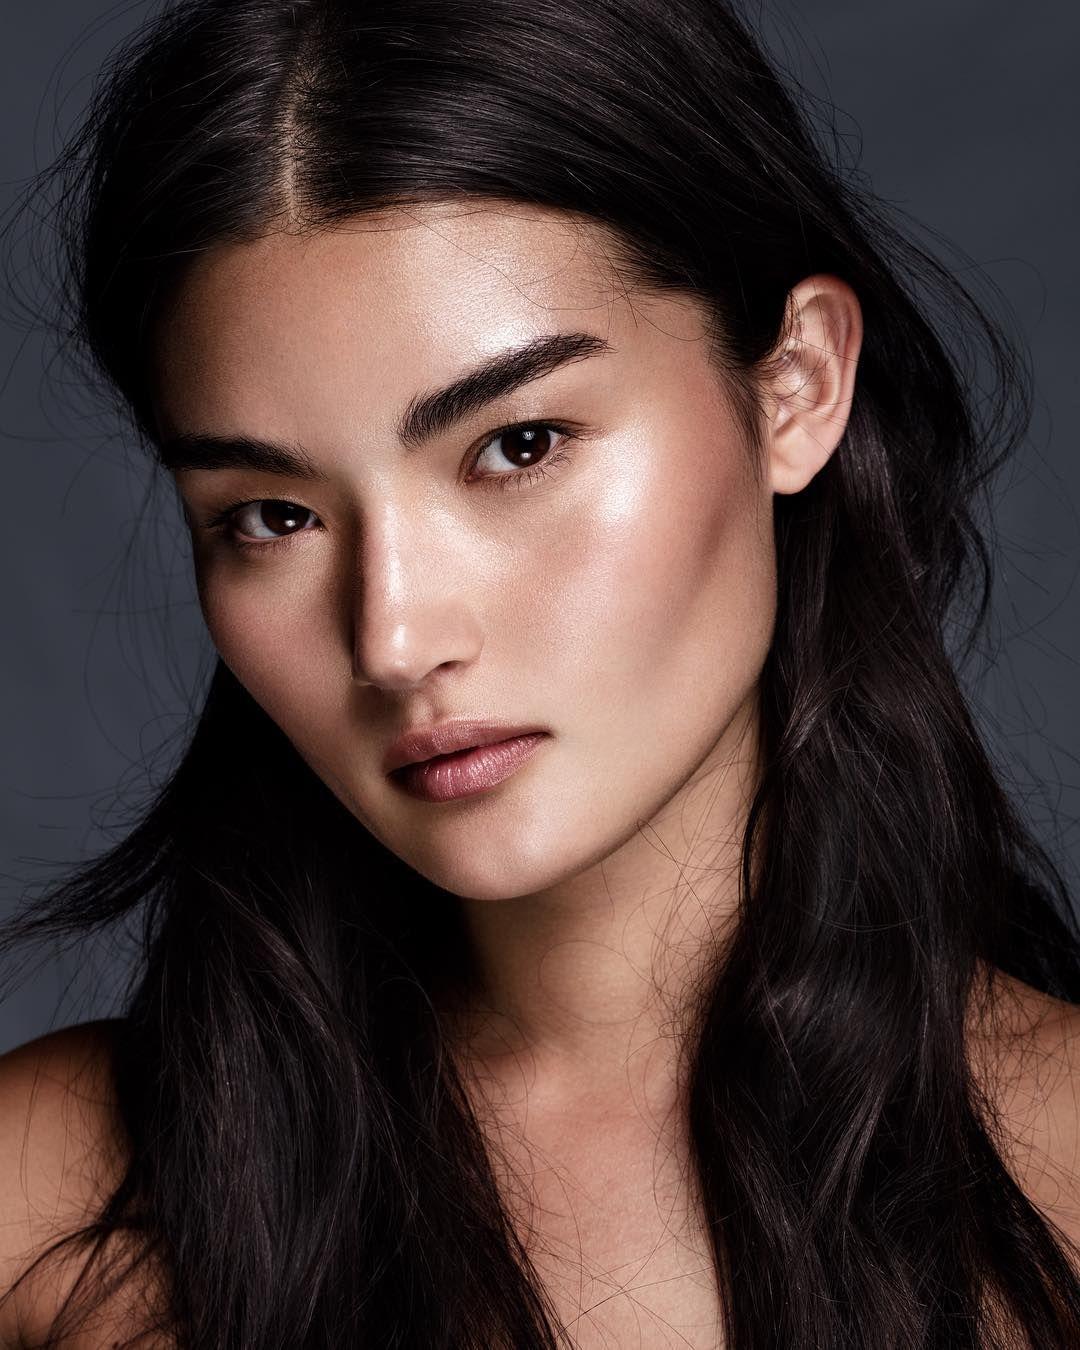 Clean Beauty Makeup Artist + Hair Stylist in Las Vegas